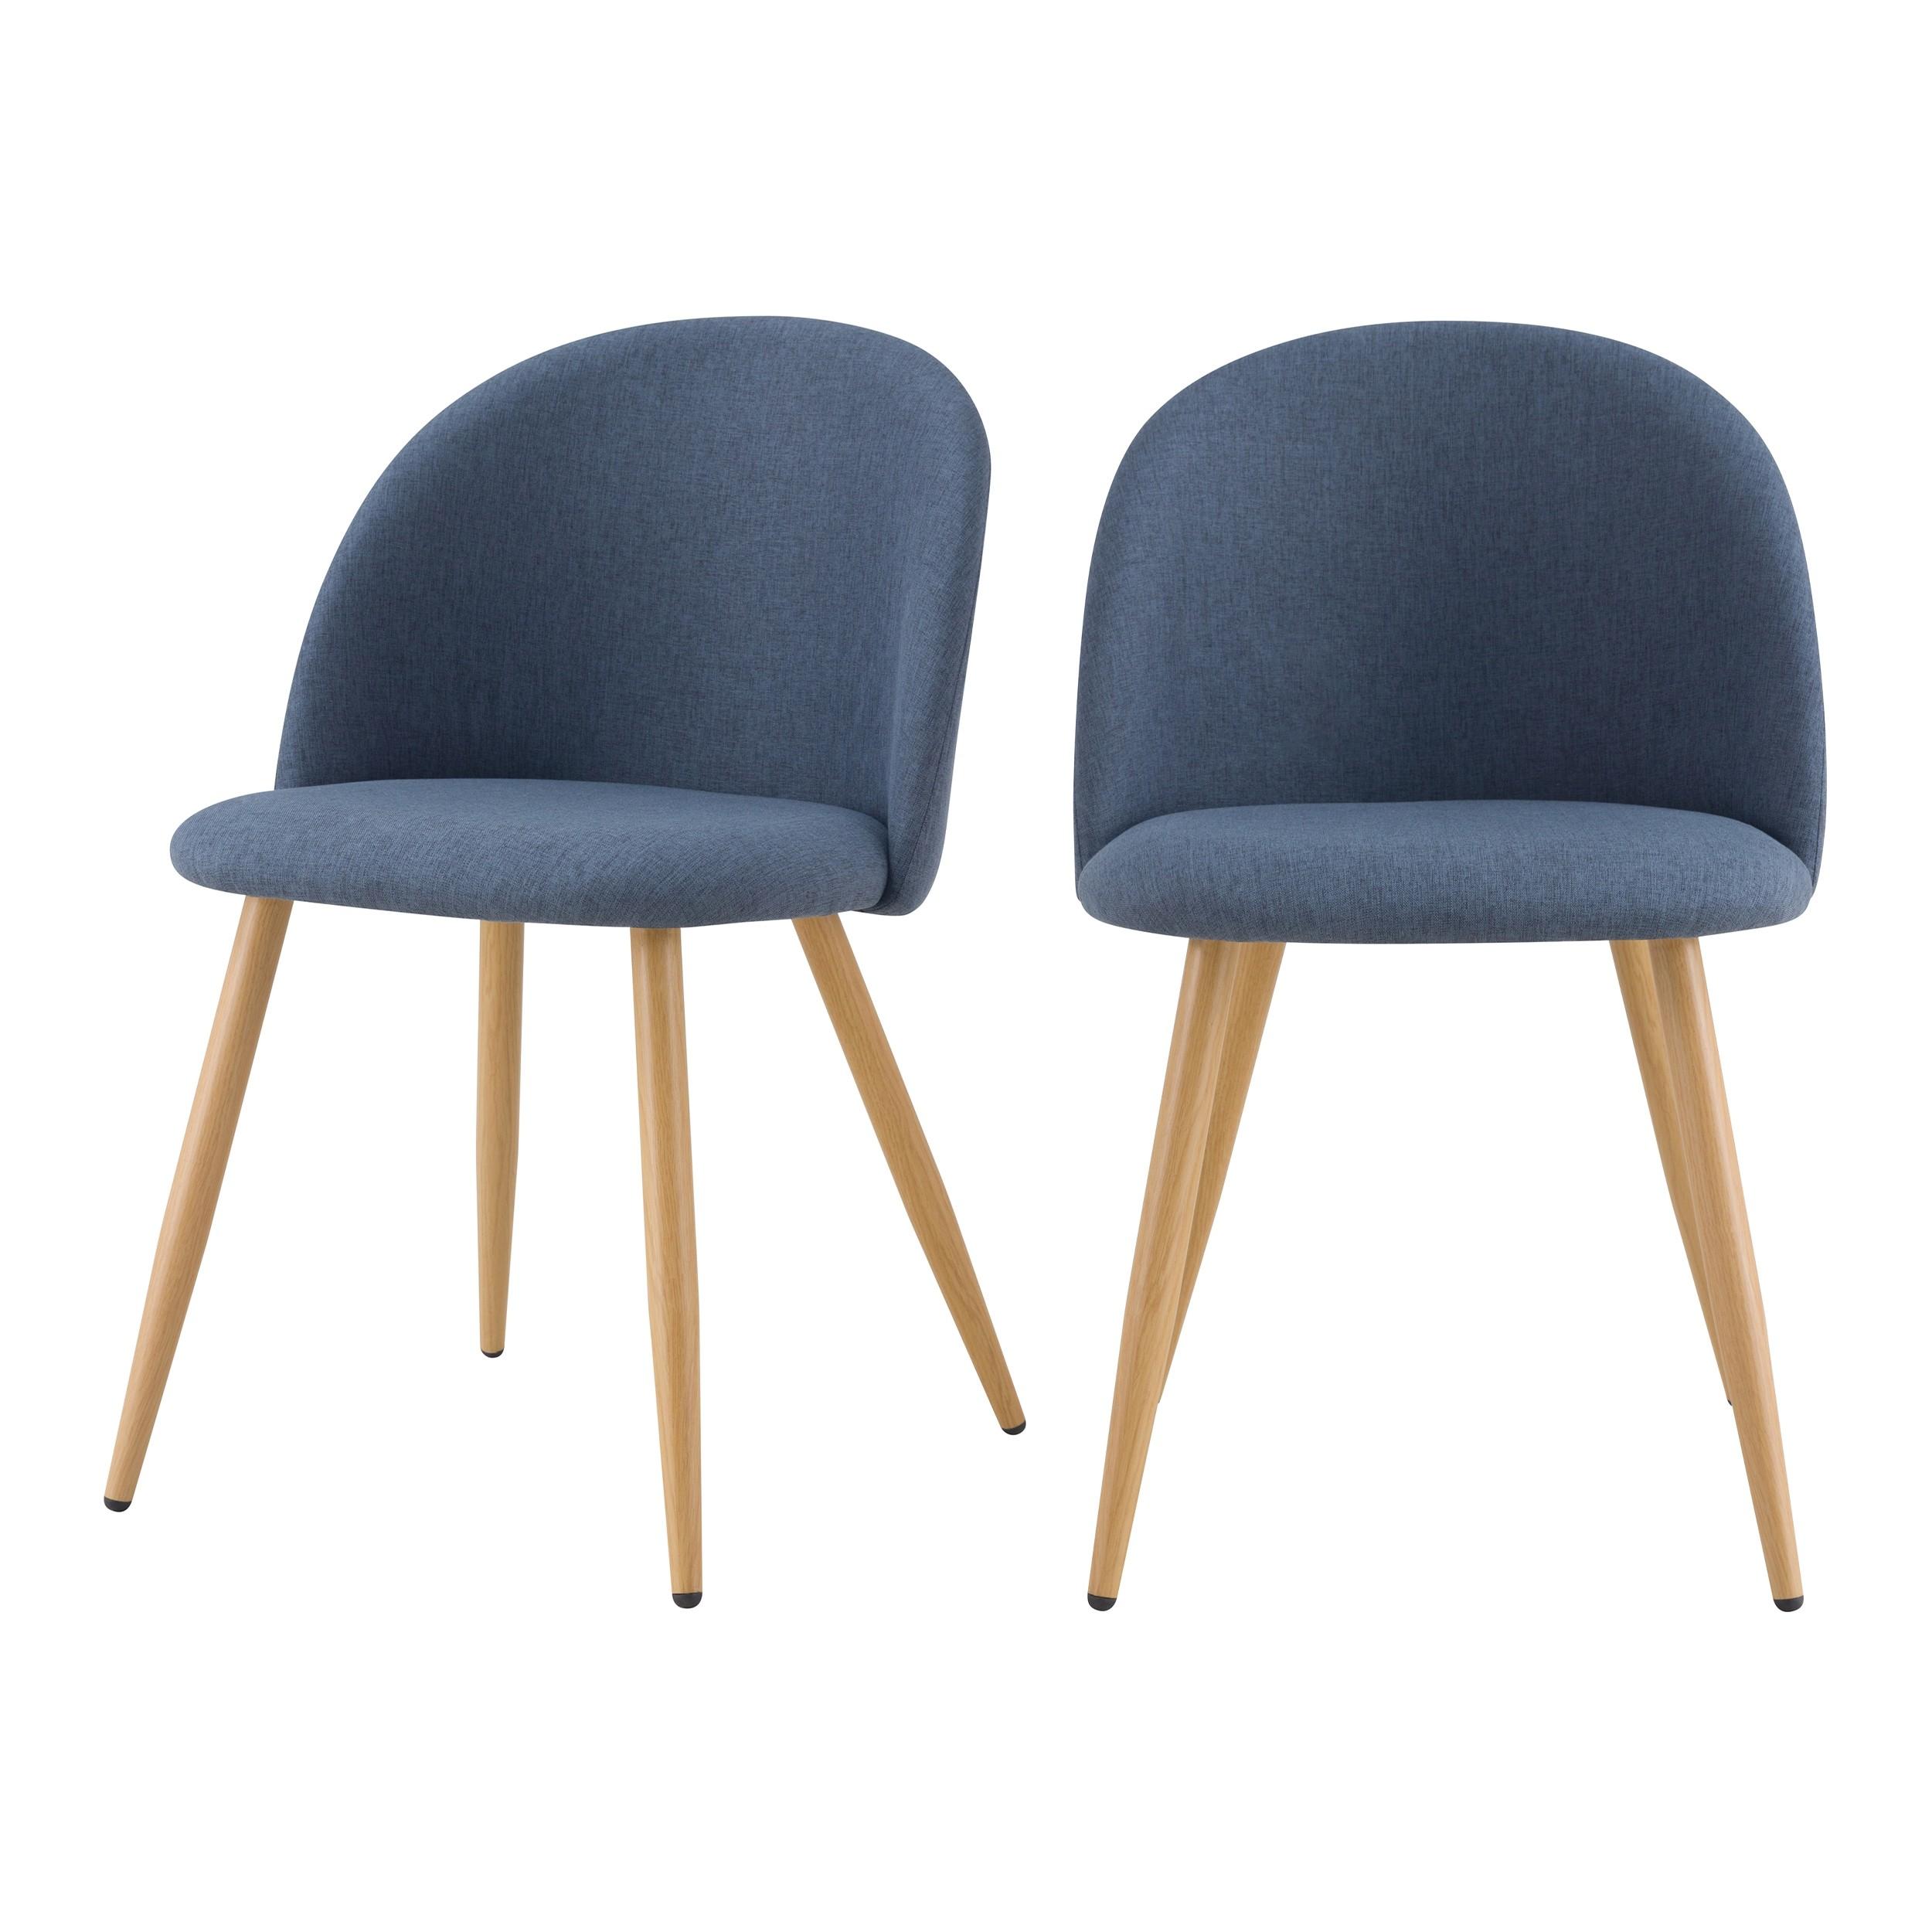 acheter chaise velours bleu gris scandinave lot de 2